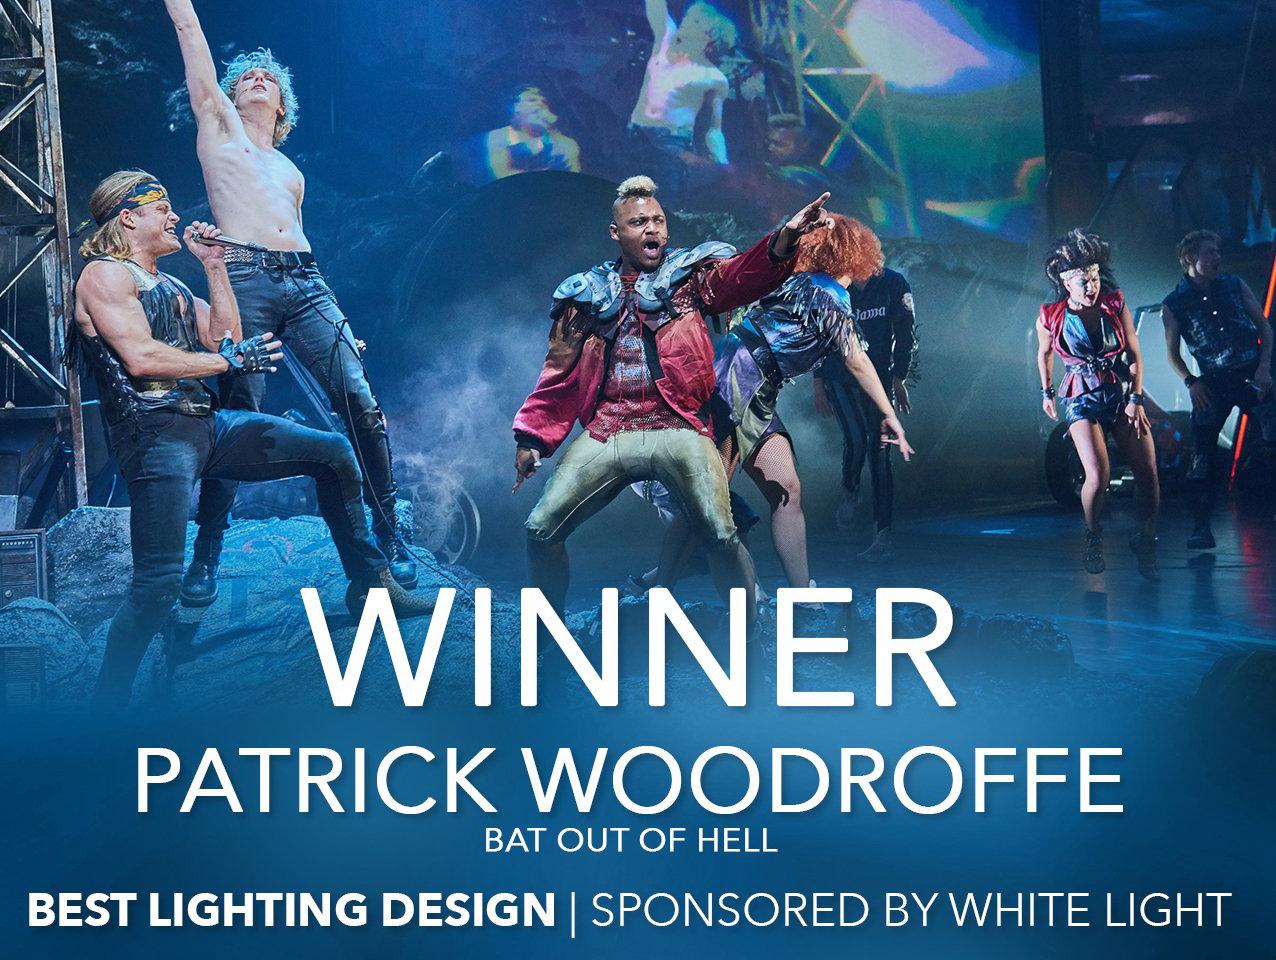 Patrick Woodroffe Won Best Lighting Design